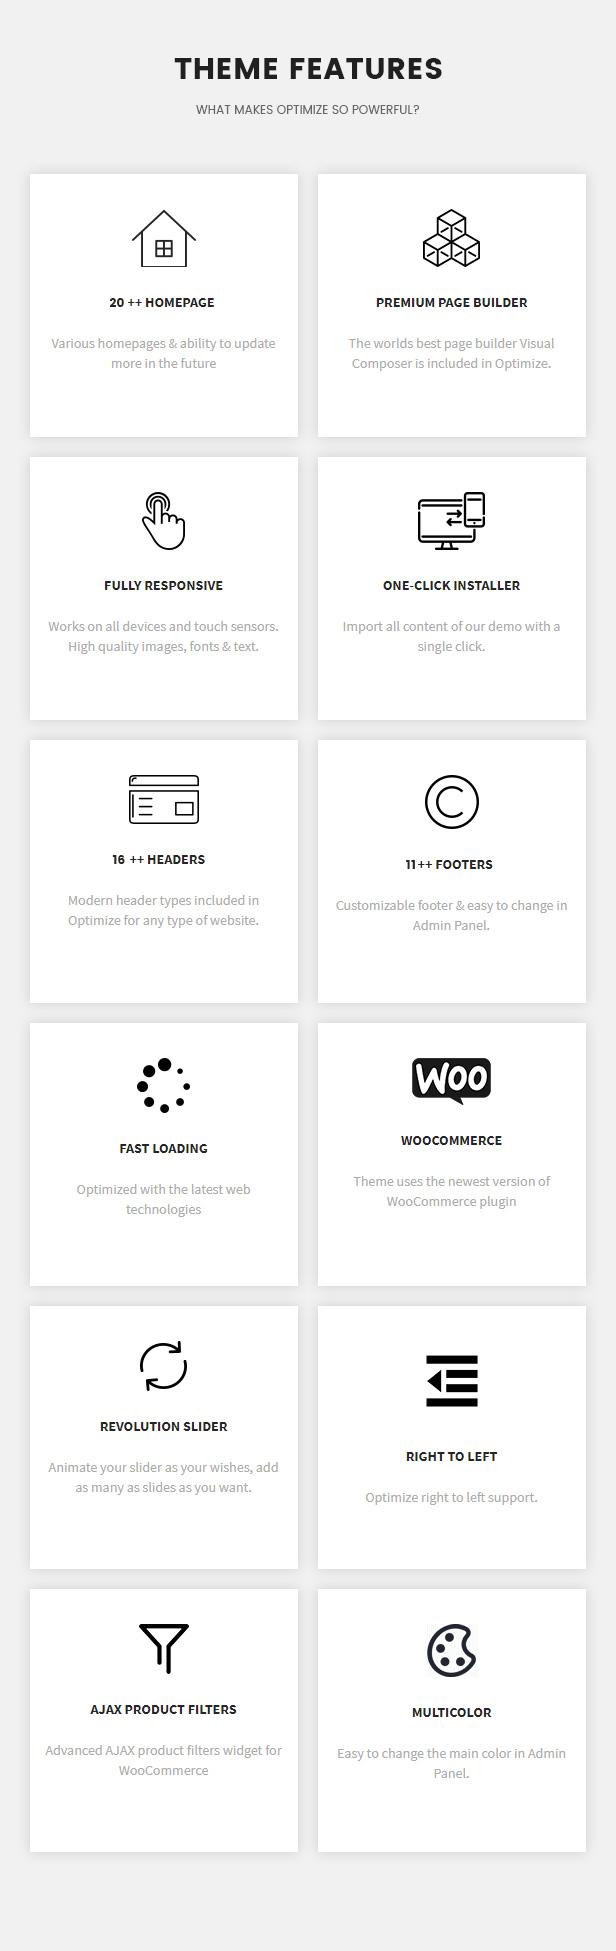 Cariana - WooCommerce Lookbook Fashion Thema